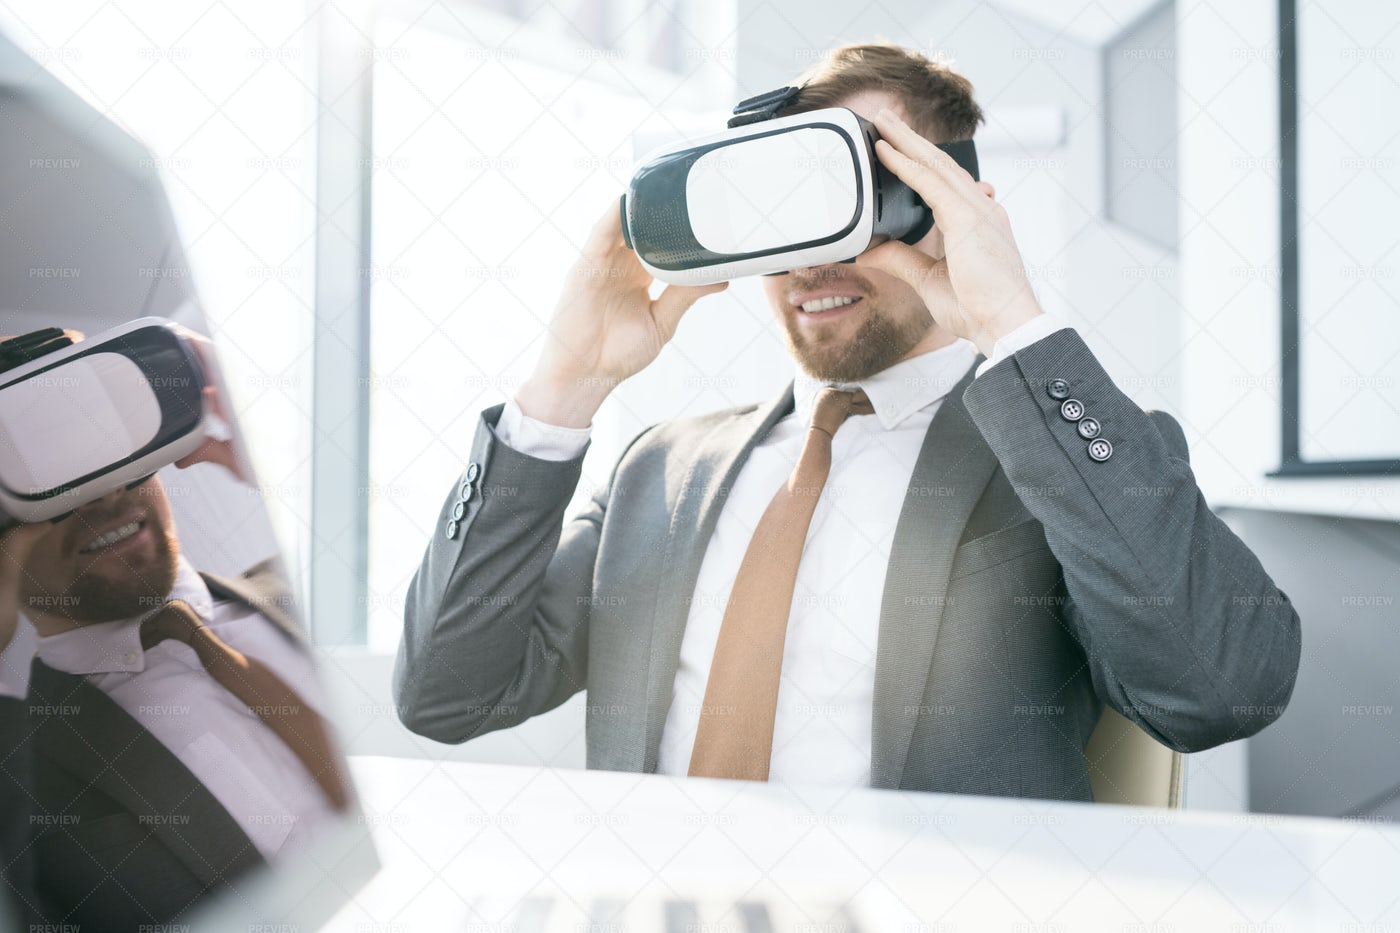 Businessman Using VR At Work: Stock Photos